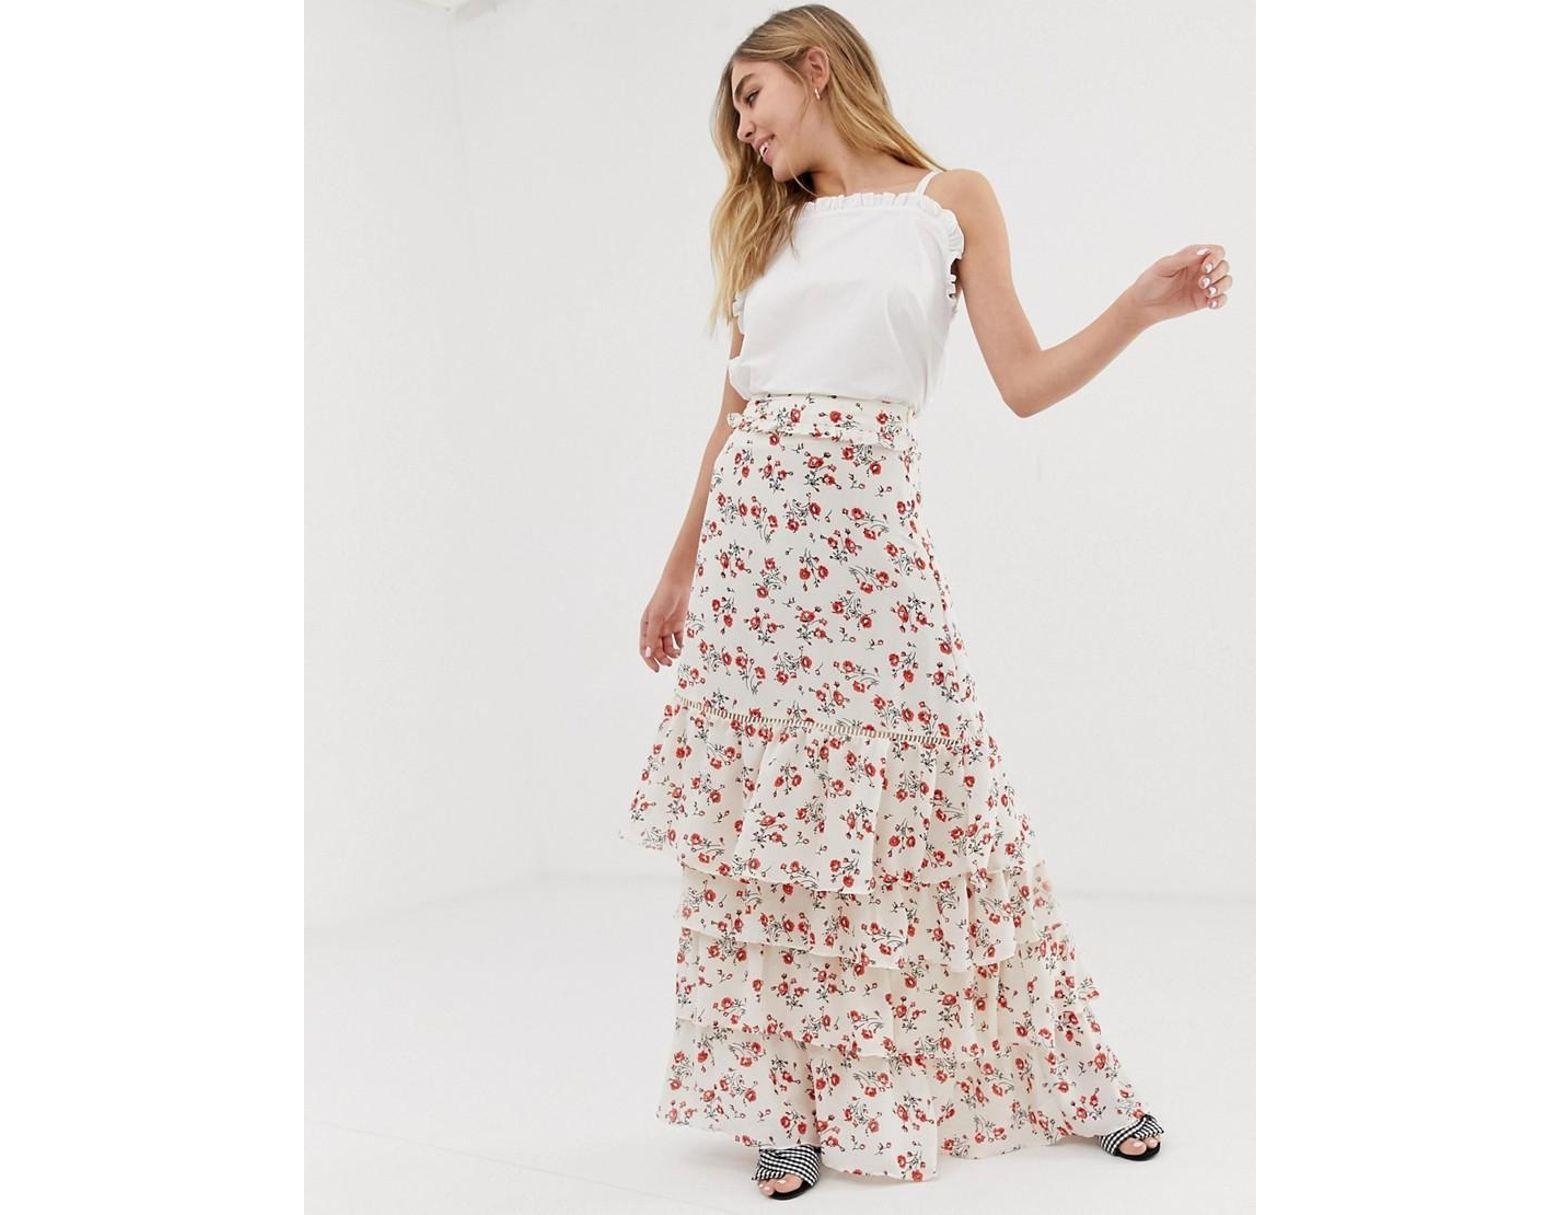 Larga Con Floral Mujer Falda Ojales rdtsxBhCQ